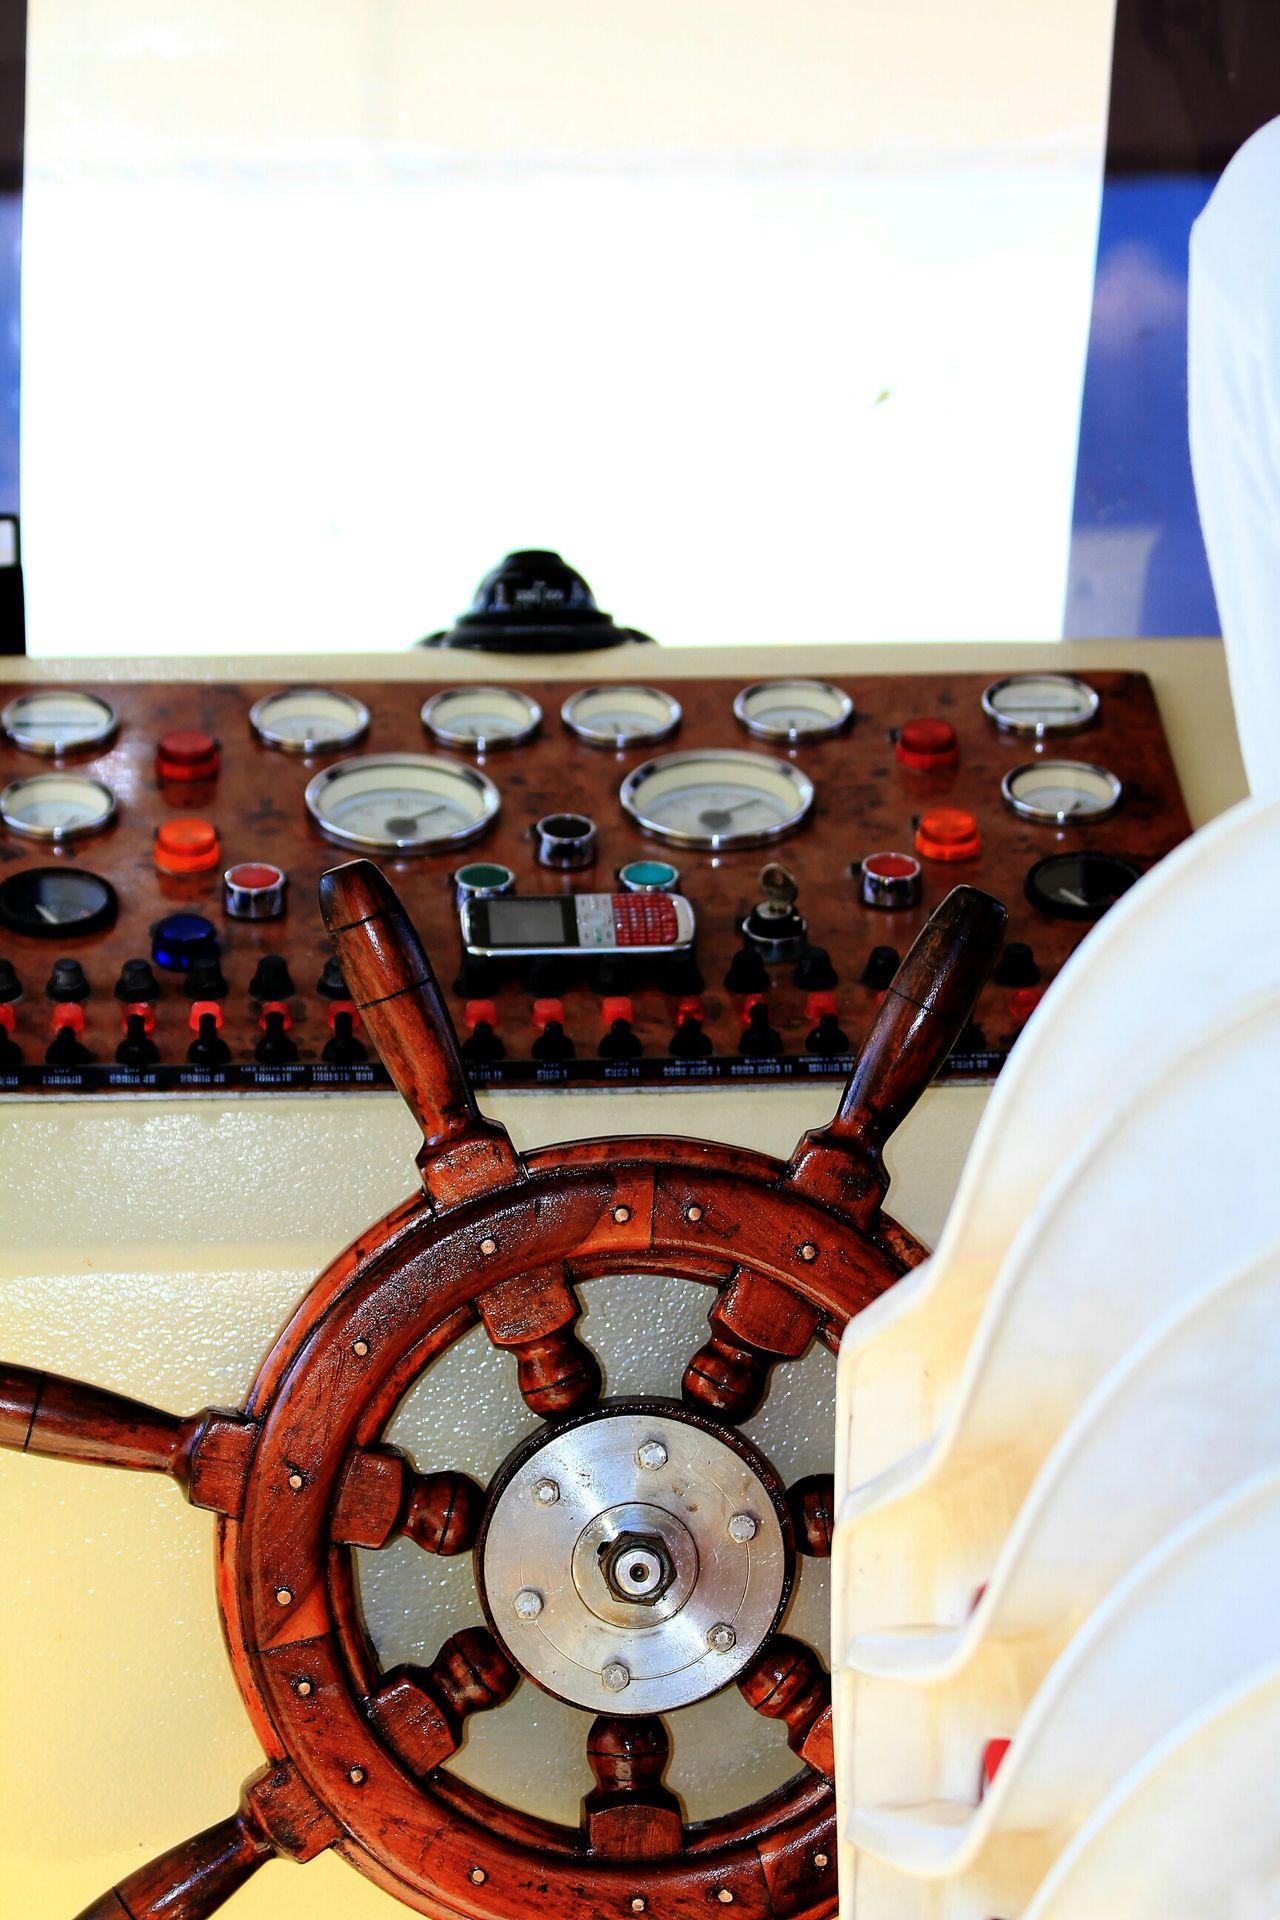 Helm Helm Old Street Art Piranhas/AL Brazil Controls Boat Rio Sao Francisco